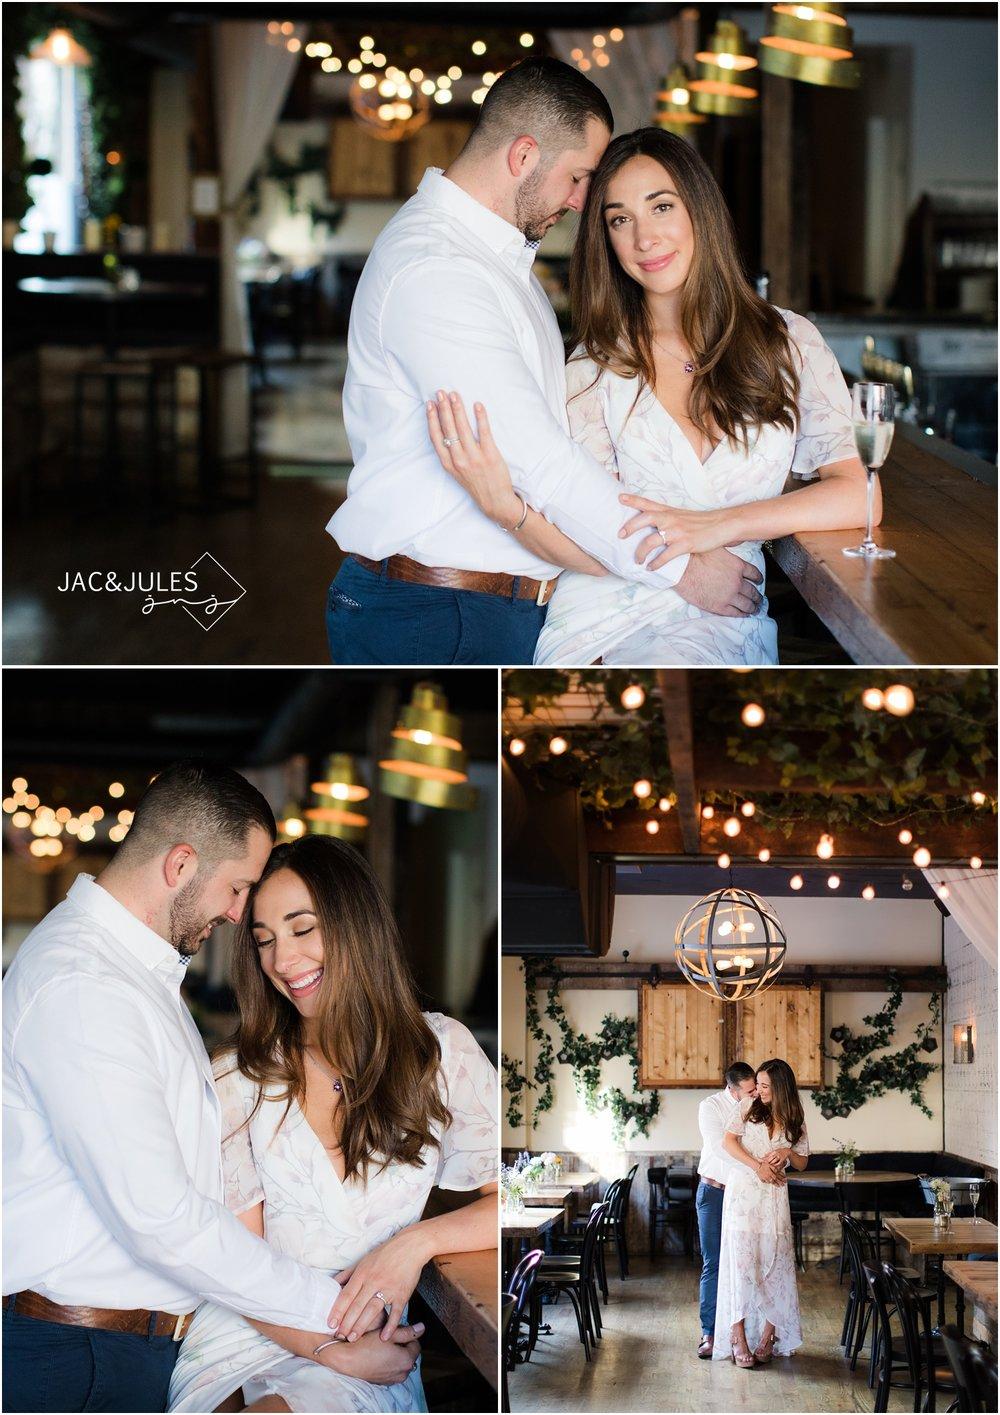 Romantic Engagement photos at Grand Vin in Hoboken, NJ.